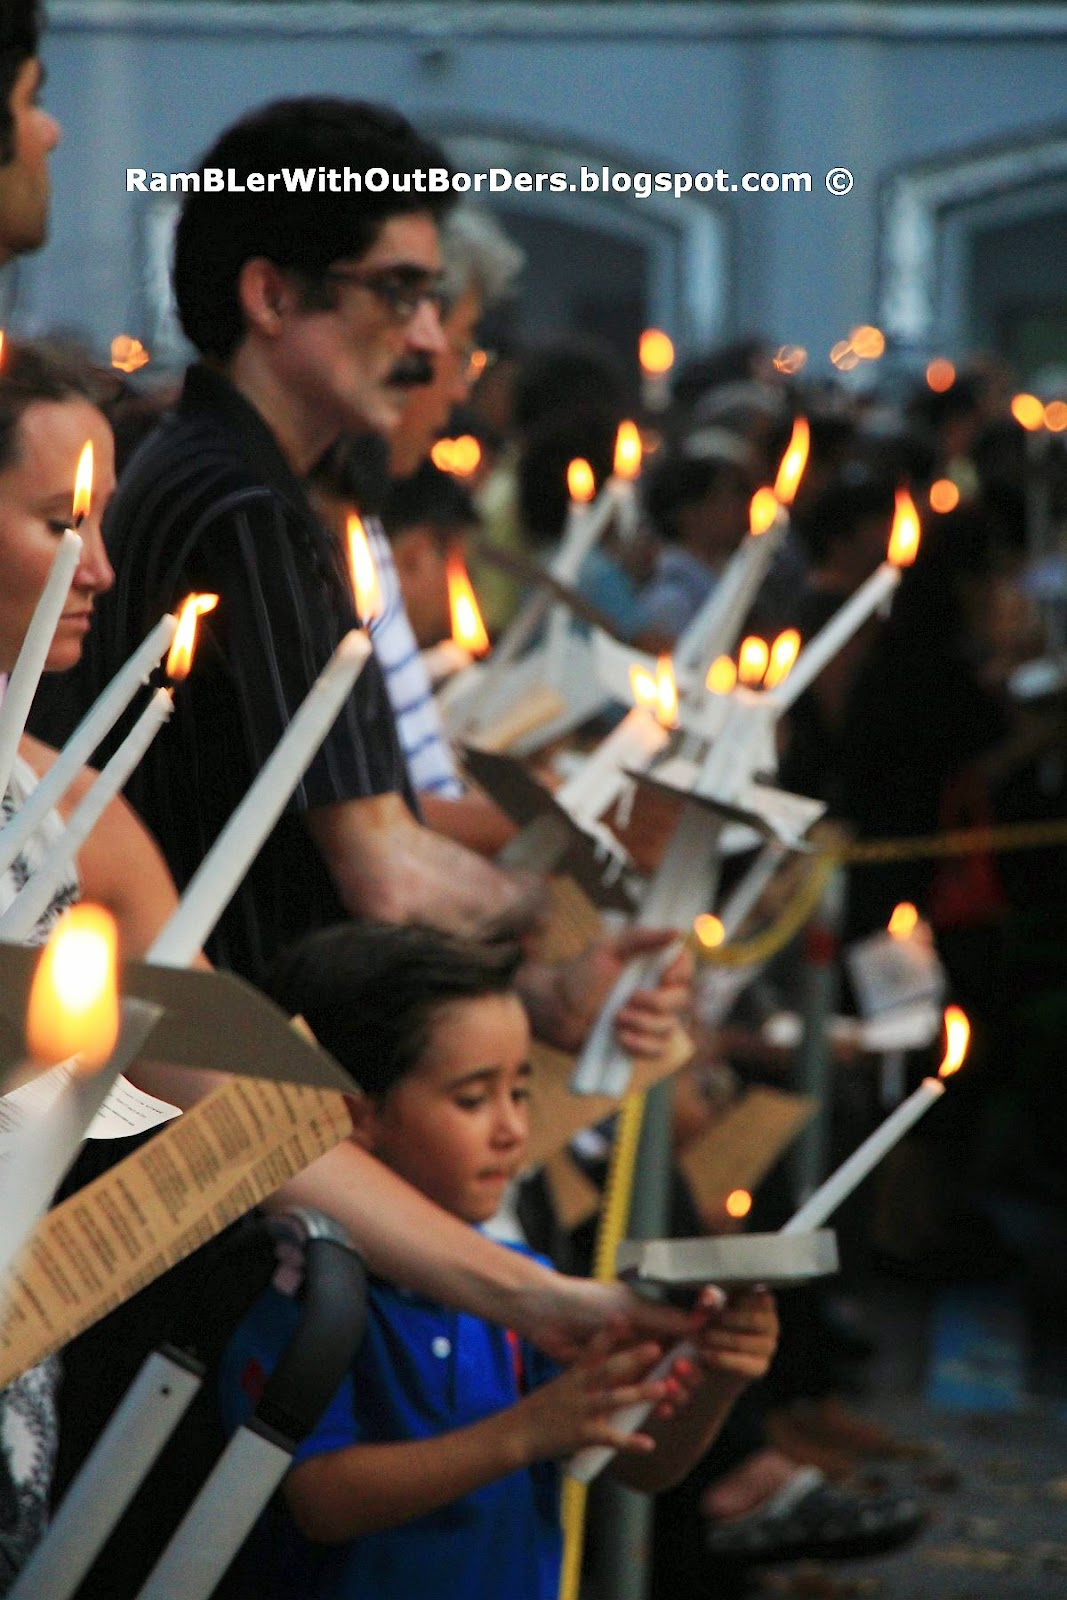 Attendants of Good Friday Candle-Light Procession, St Joseph's Church, Victoria St, Singapore